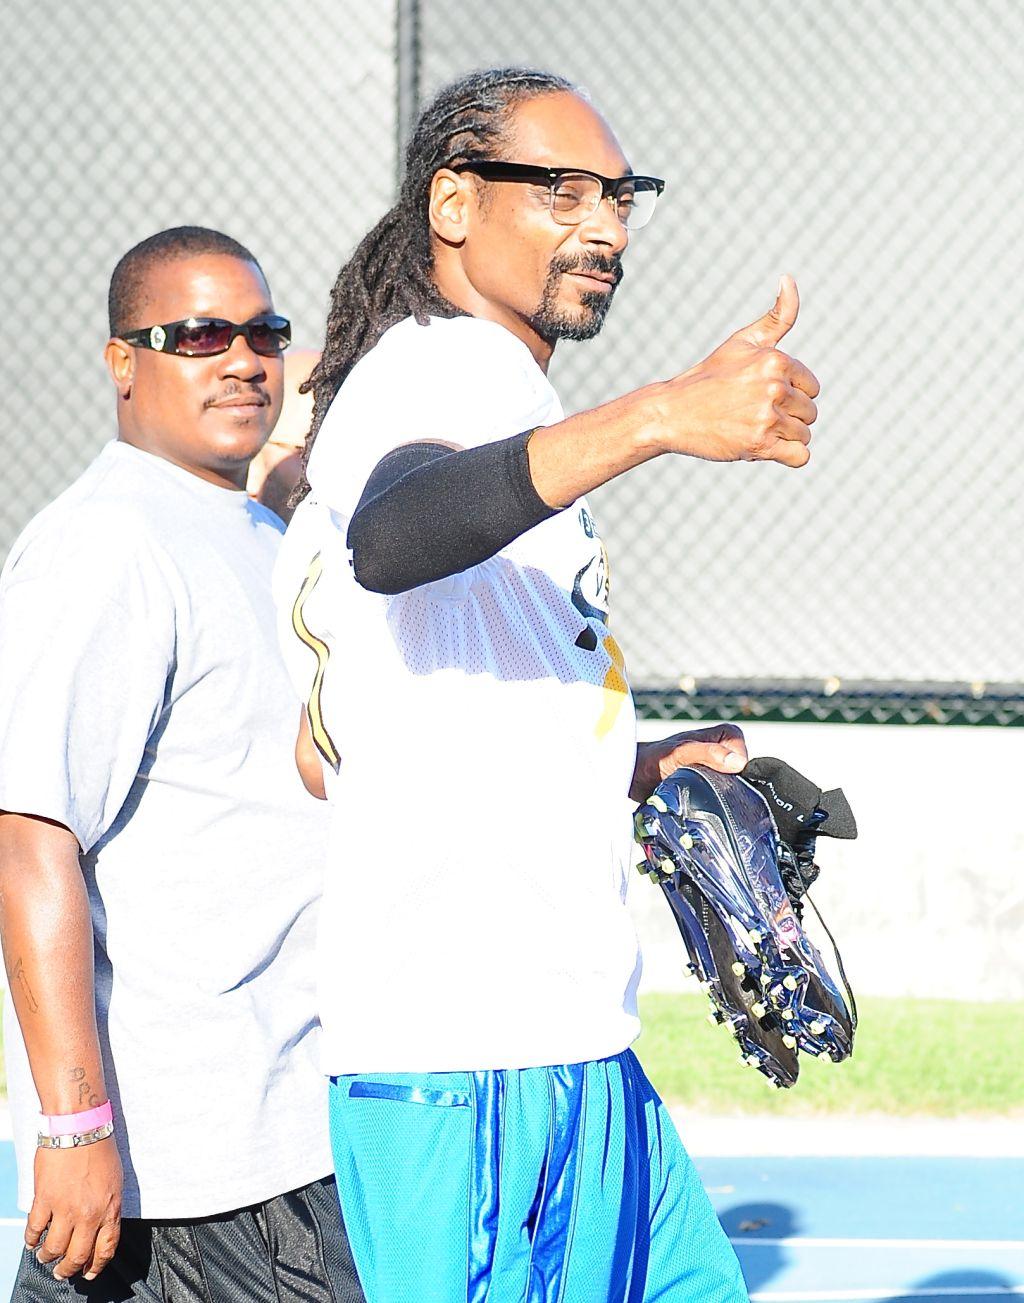 Snoop Dogg,